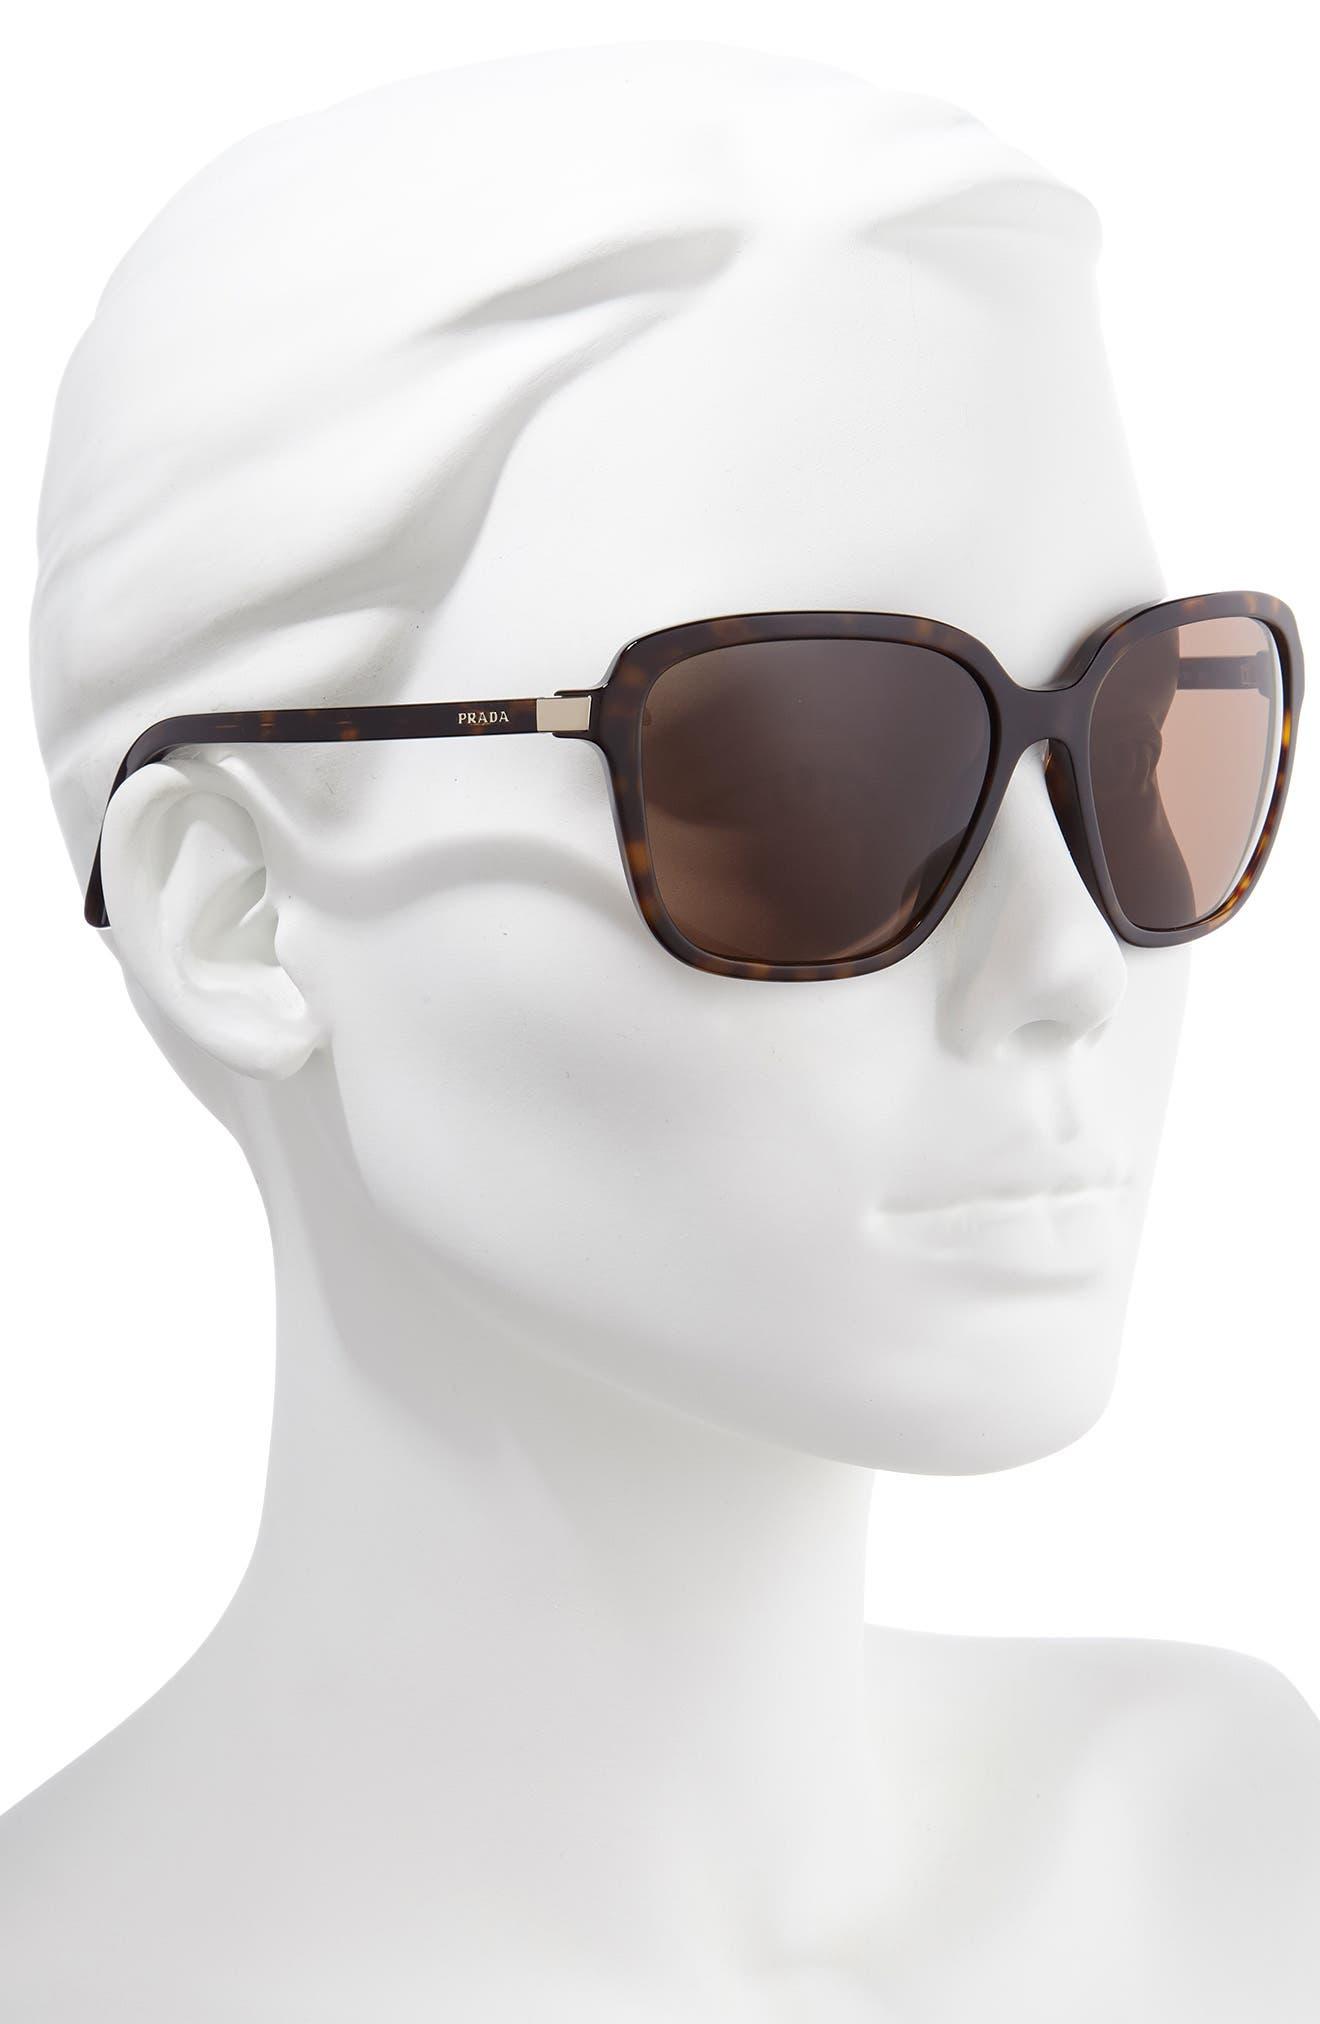 Prada Sunglasses Pillow 58mm Square Sunglasses